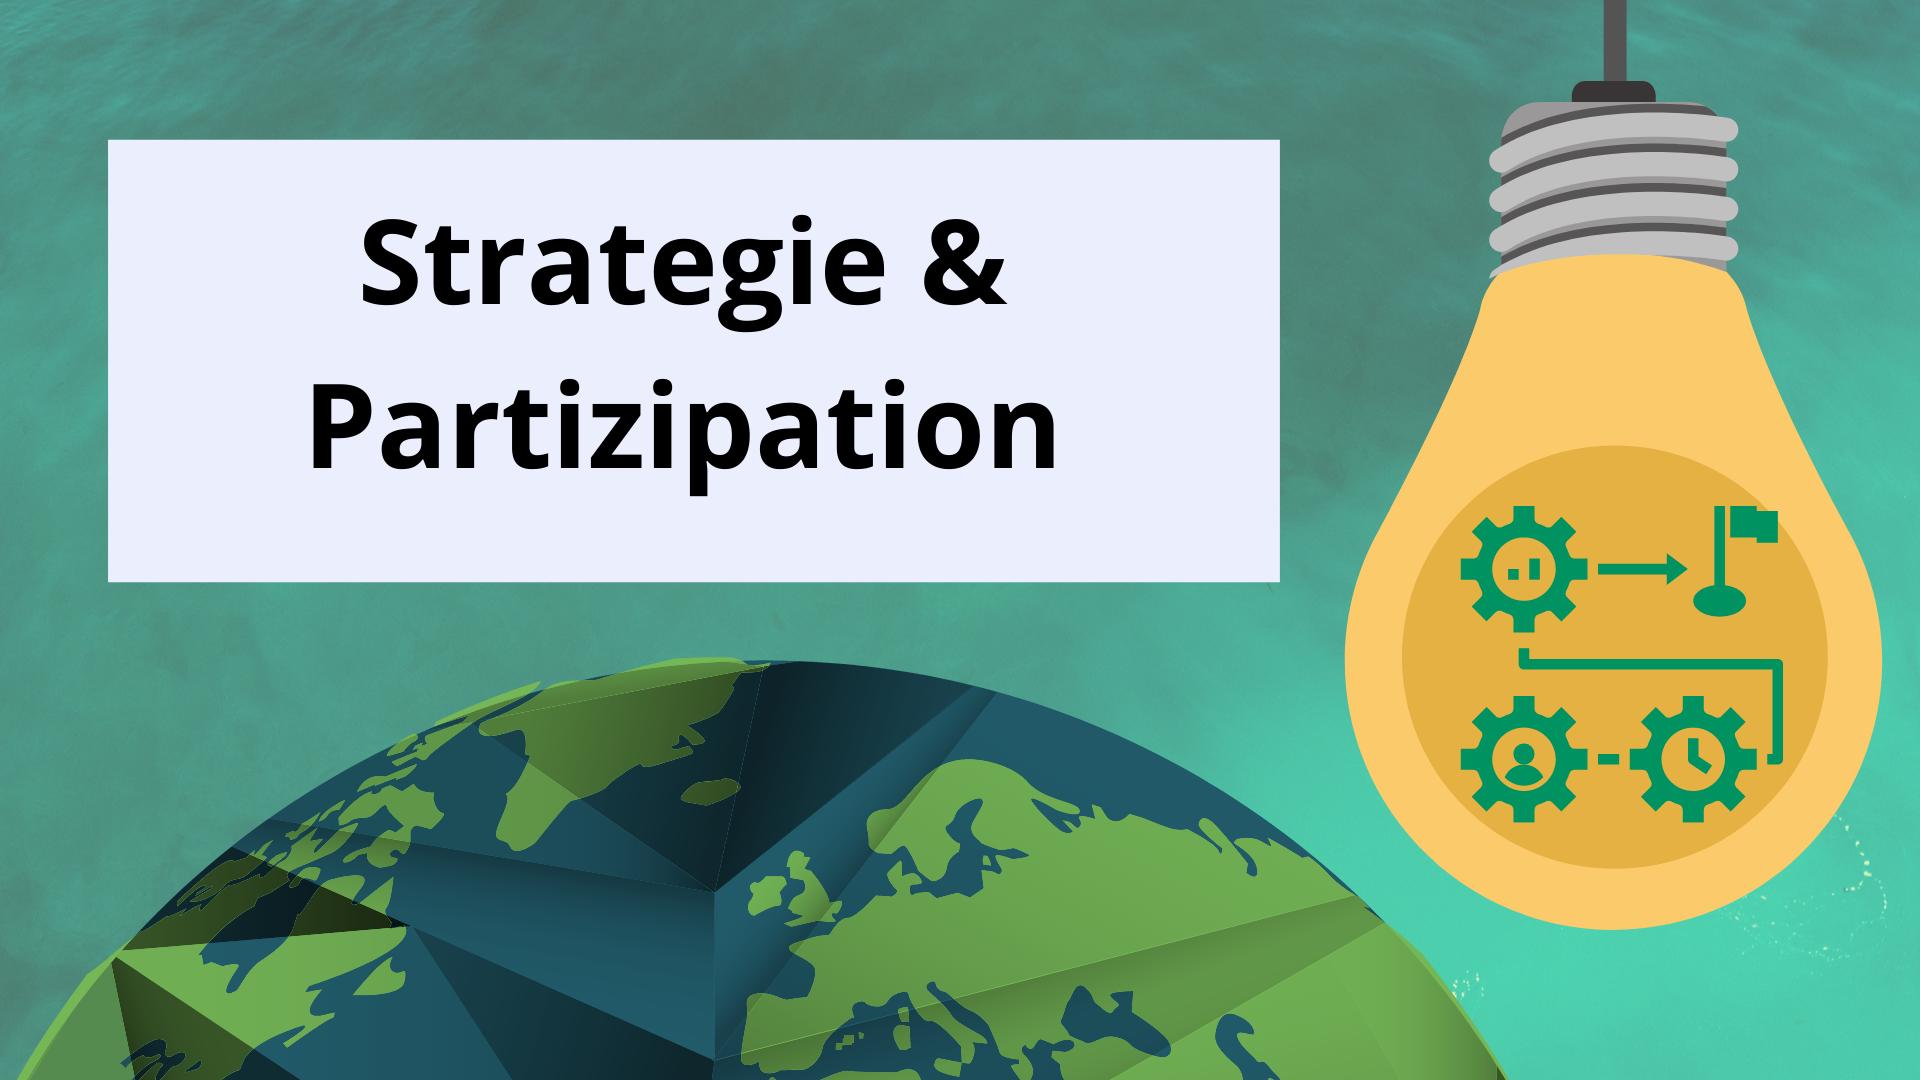 Strategie & Partizipation